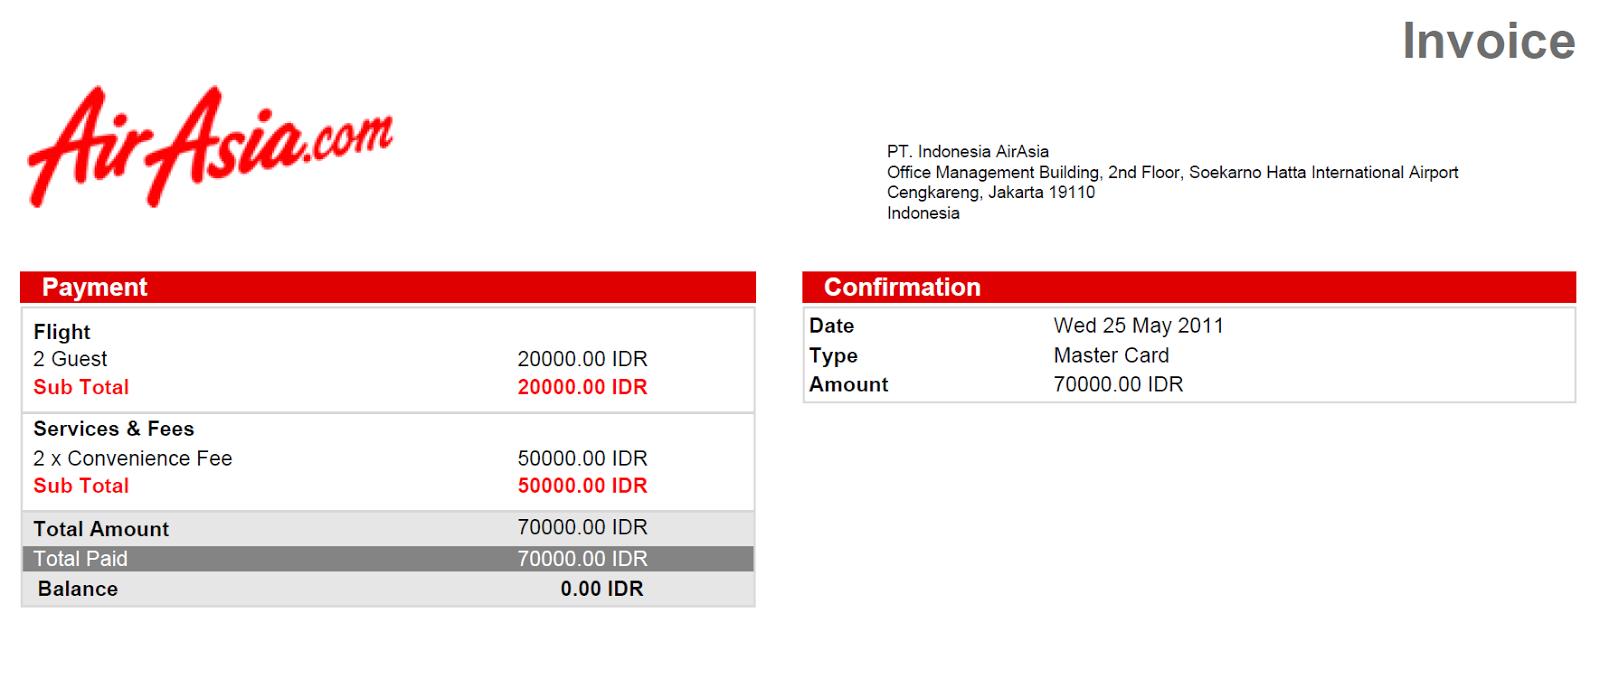 Pertama Ke Luar Negeri Airasia Membawaku Berkelana Dua Negara Tiket Air Asia Screen Capture Bukti Booking Kami Yang Pergi Malaysia Dengan Membayar Rp 35000 Saja Promo Nol Rupiah Itu Beneran Ada Lho